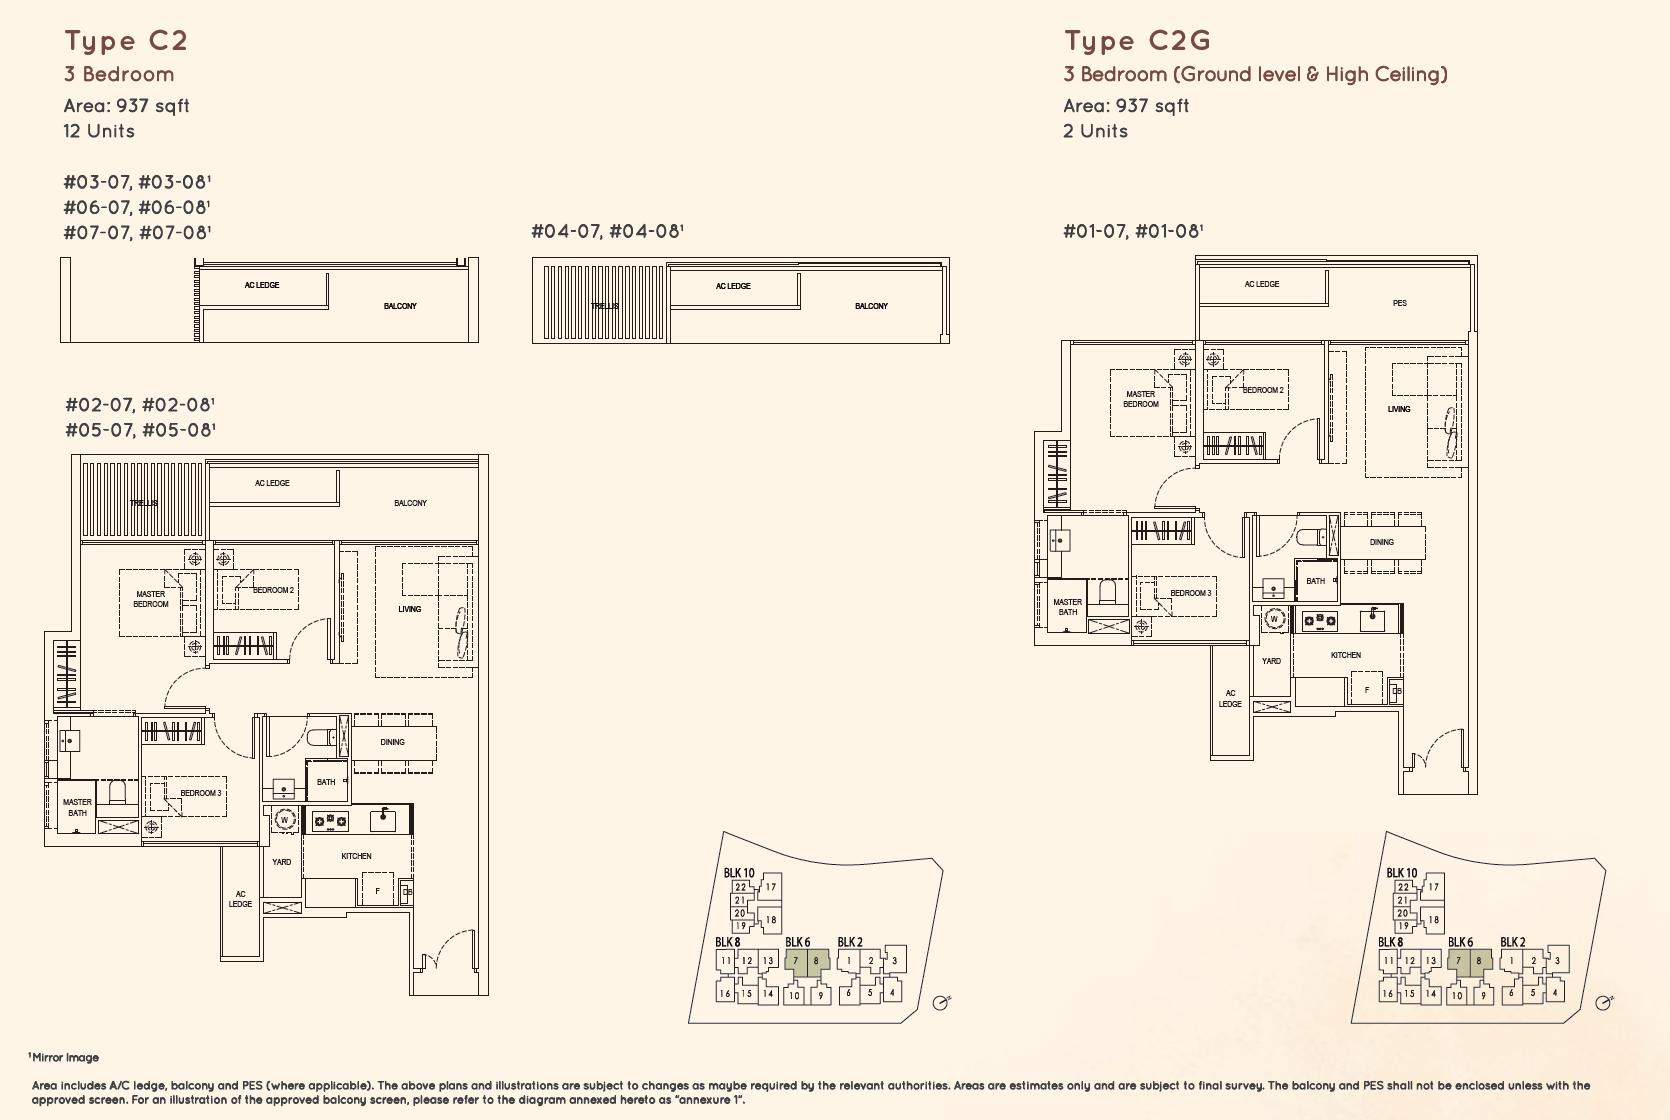 Kandis Residence 3 bedroom floor plan type C2